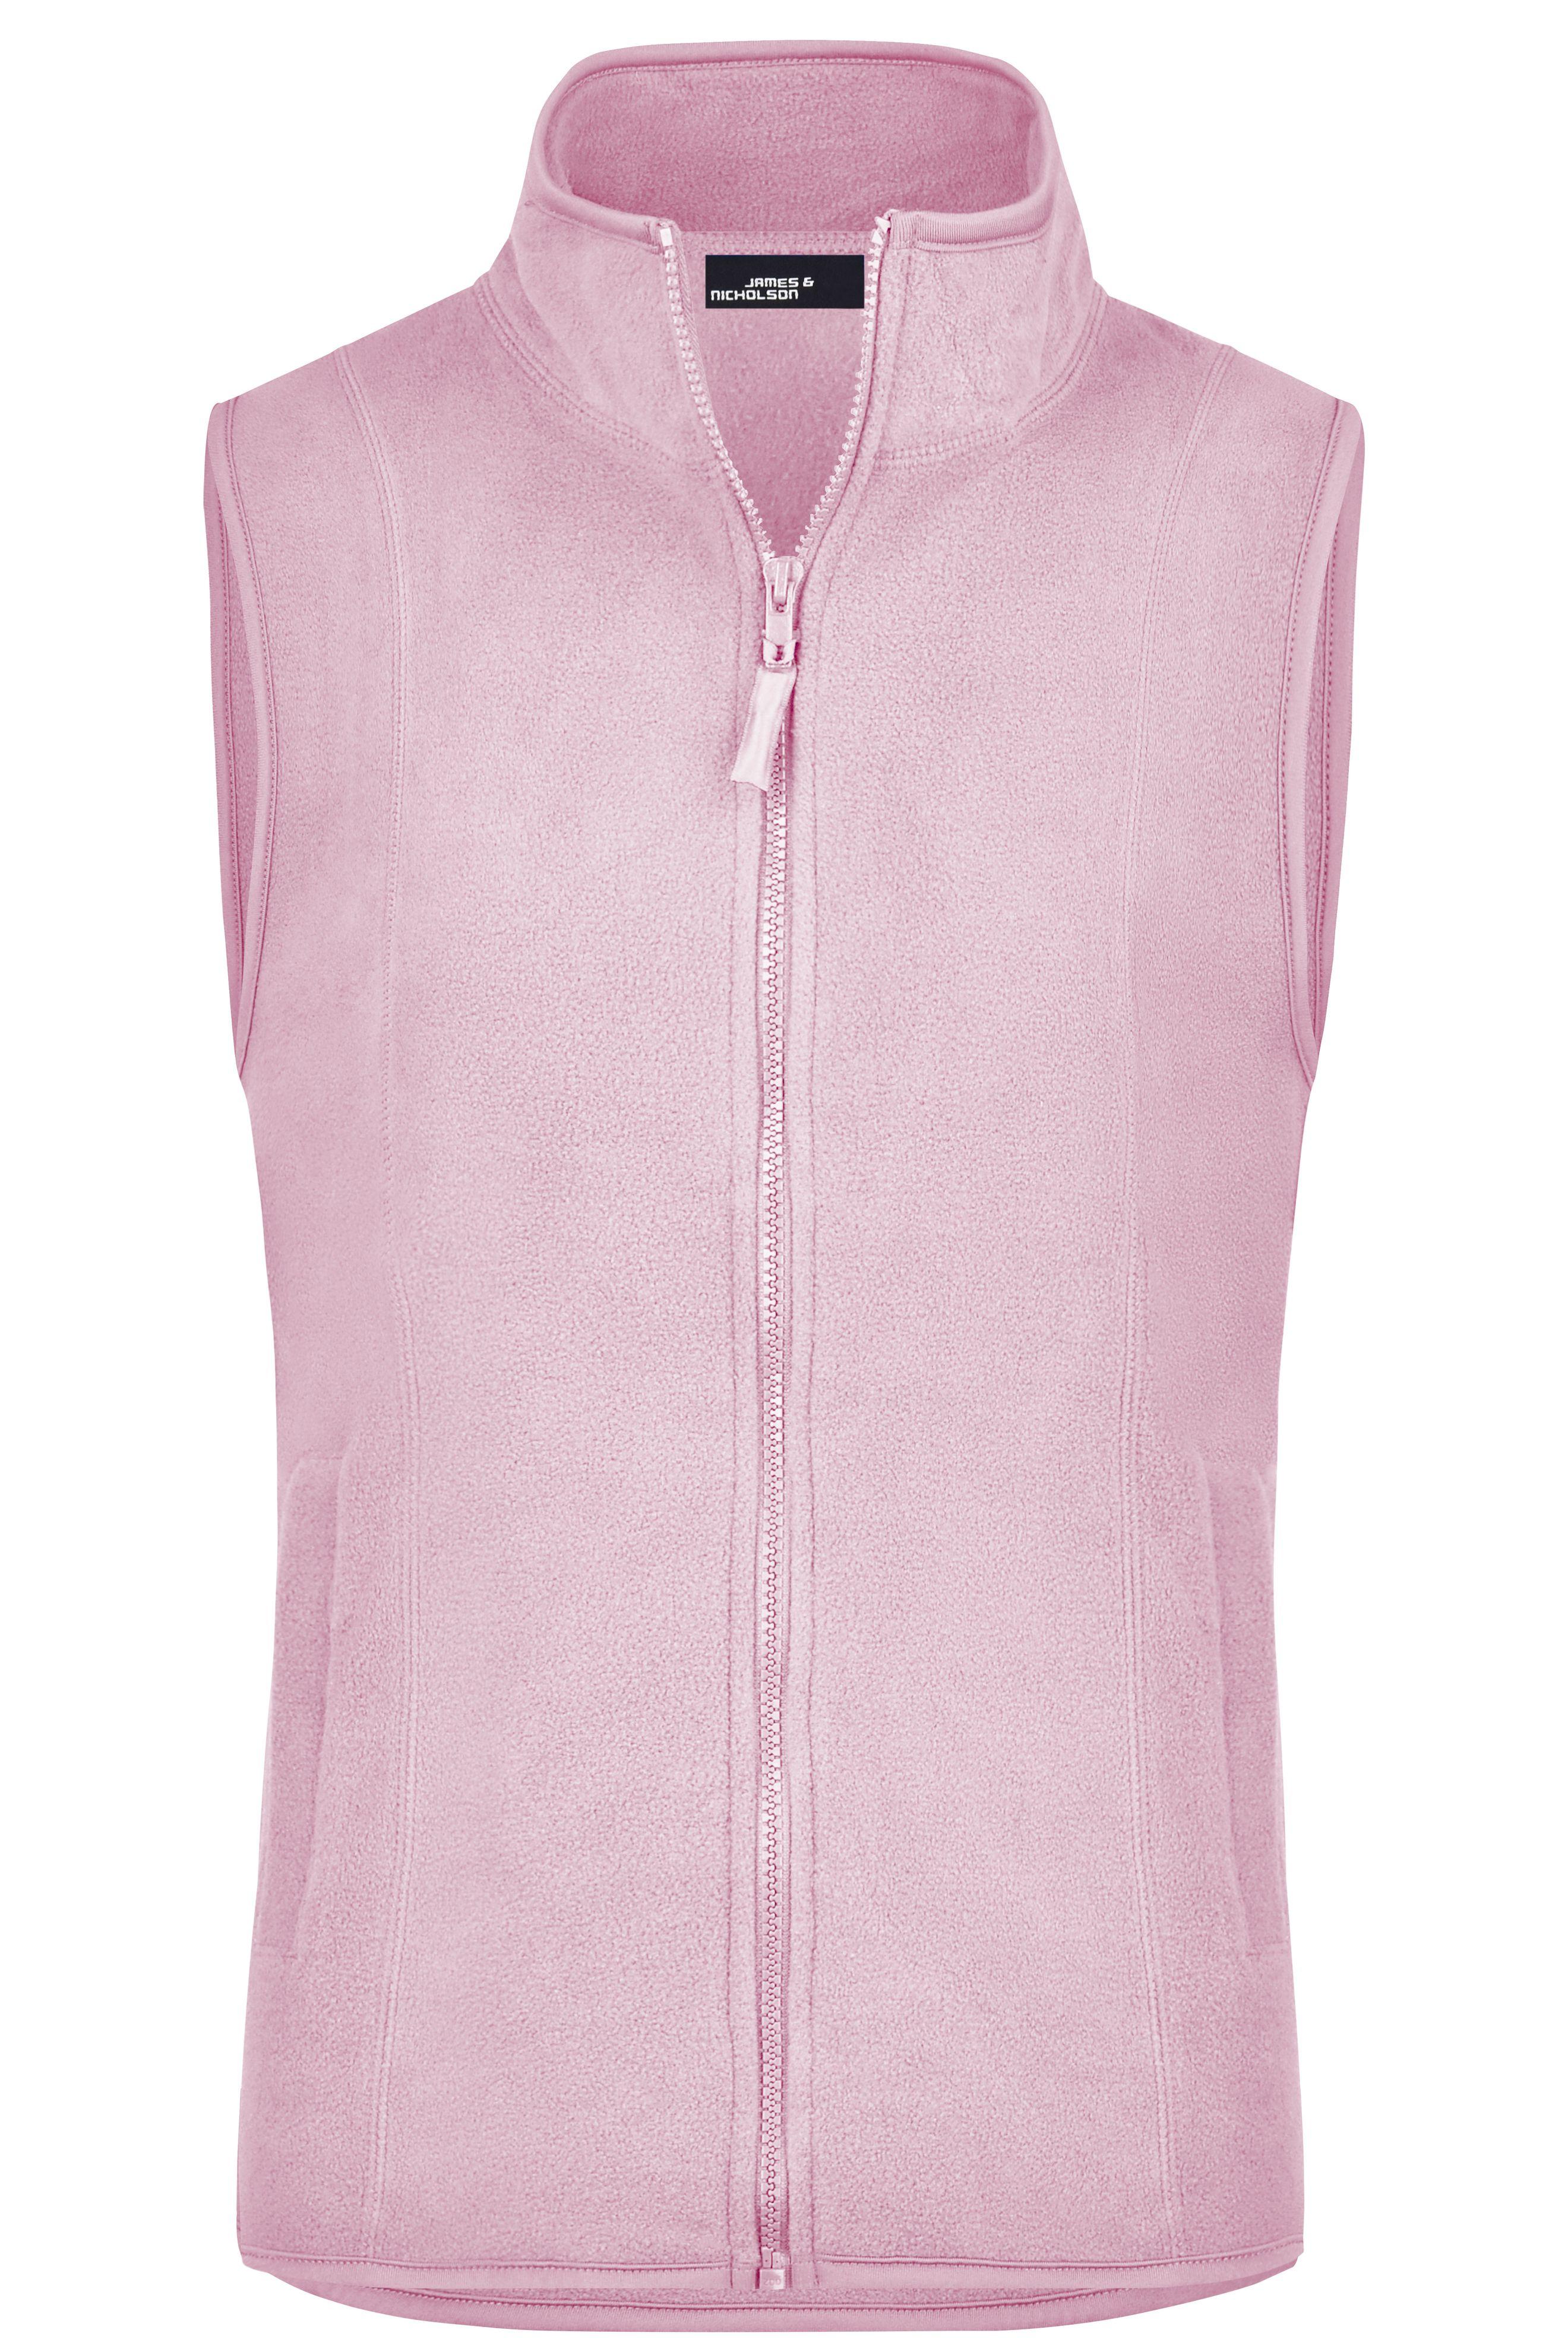 James /& Nicholson Girly Microfleece Weste Vest Fleece JN048 Damen Weste